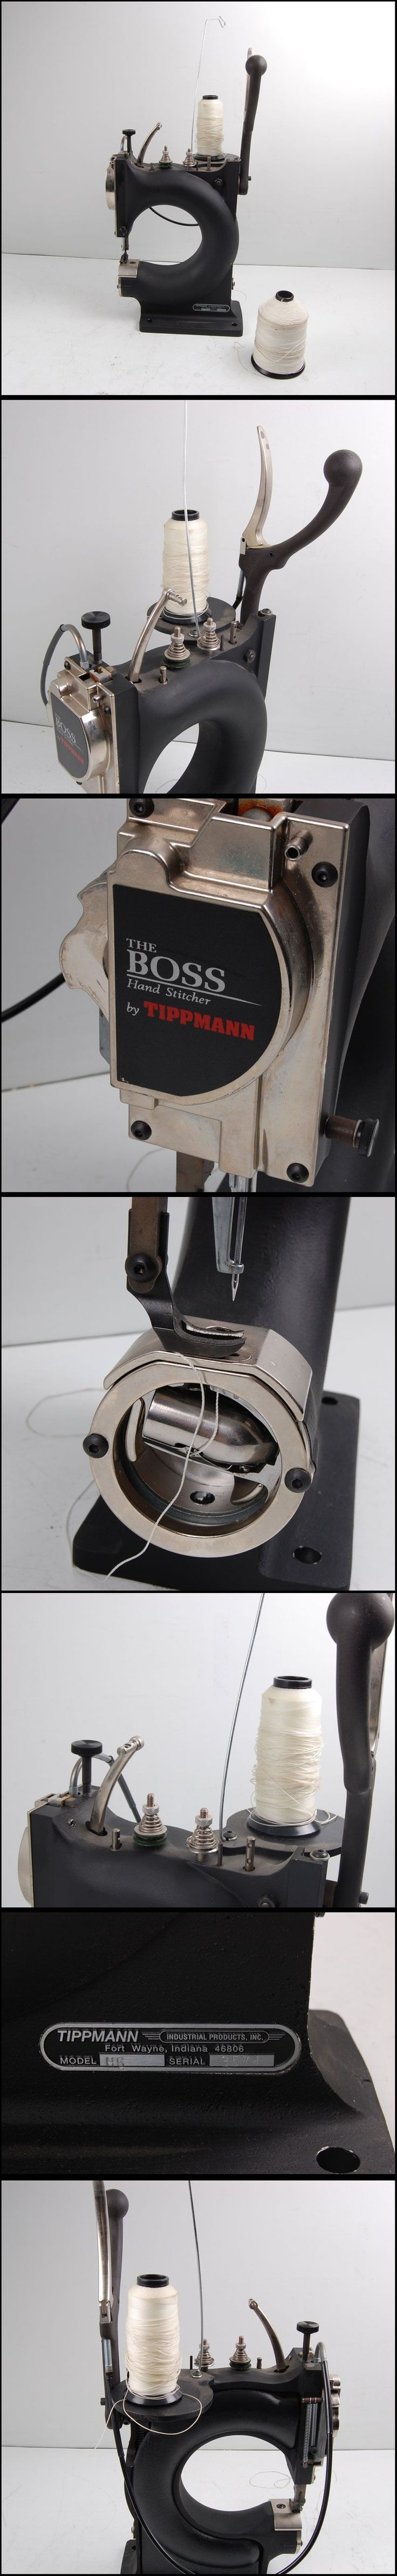 .// Tippmann Boss Model HS Hand Stitcher Leather Sewing Machine. Pinned by Ellen Rus.